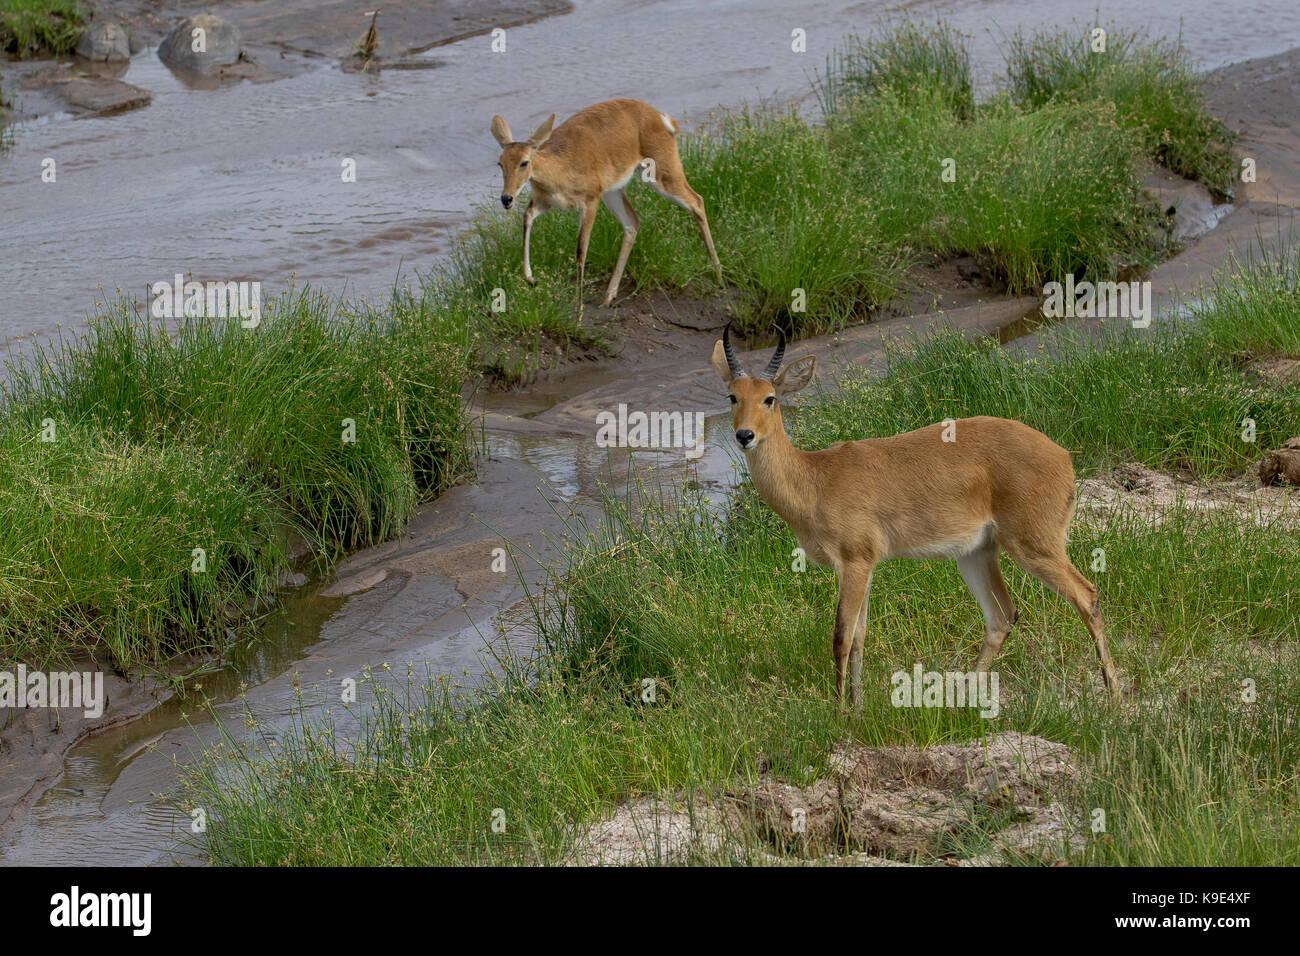 Taranguire National Park - Stock Image